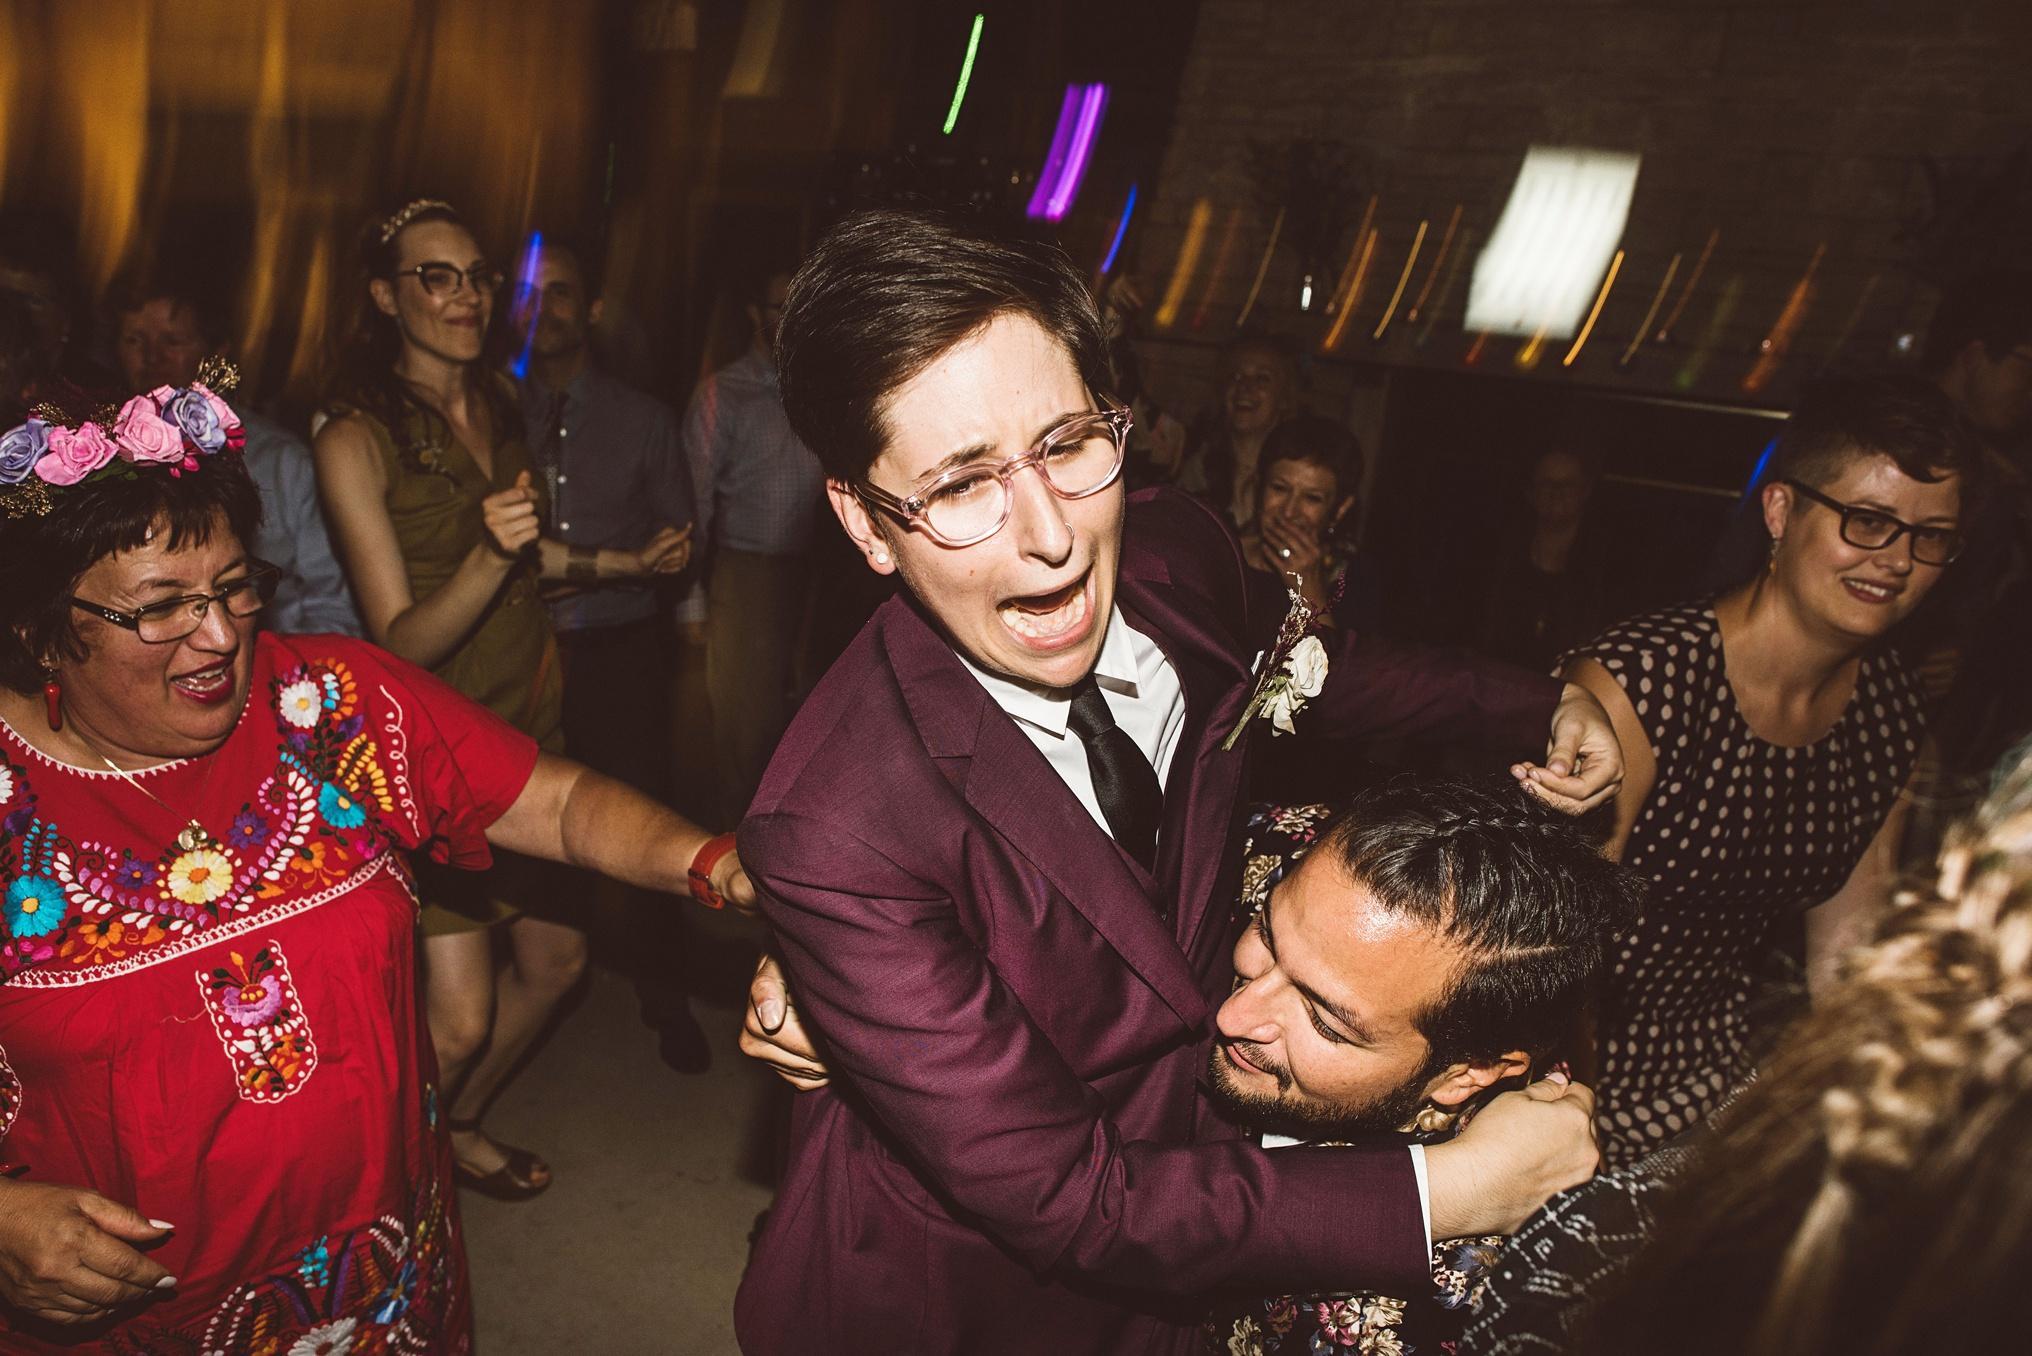 best_wedding_photography_2017_by_lucas_botz_photography_143.jpg